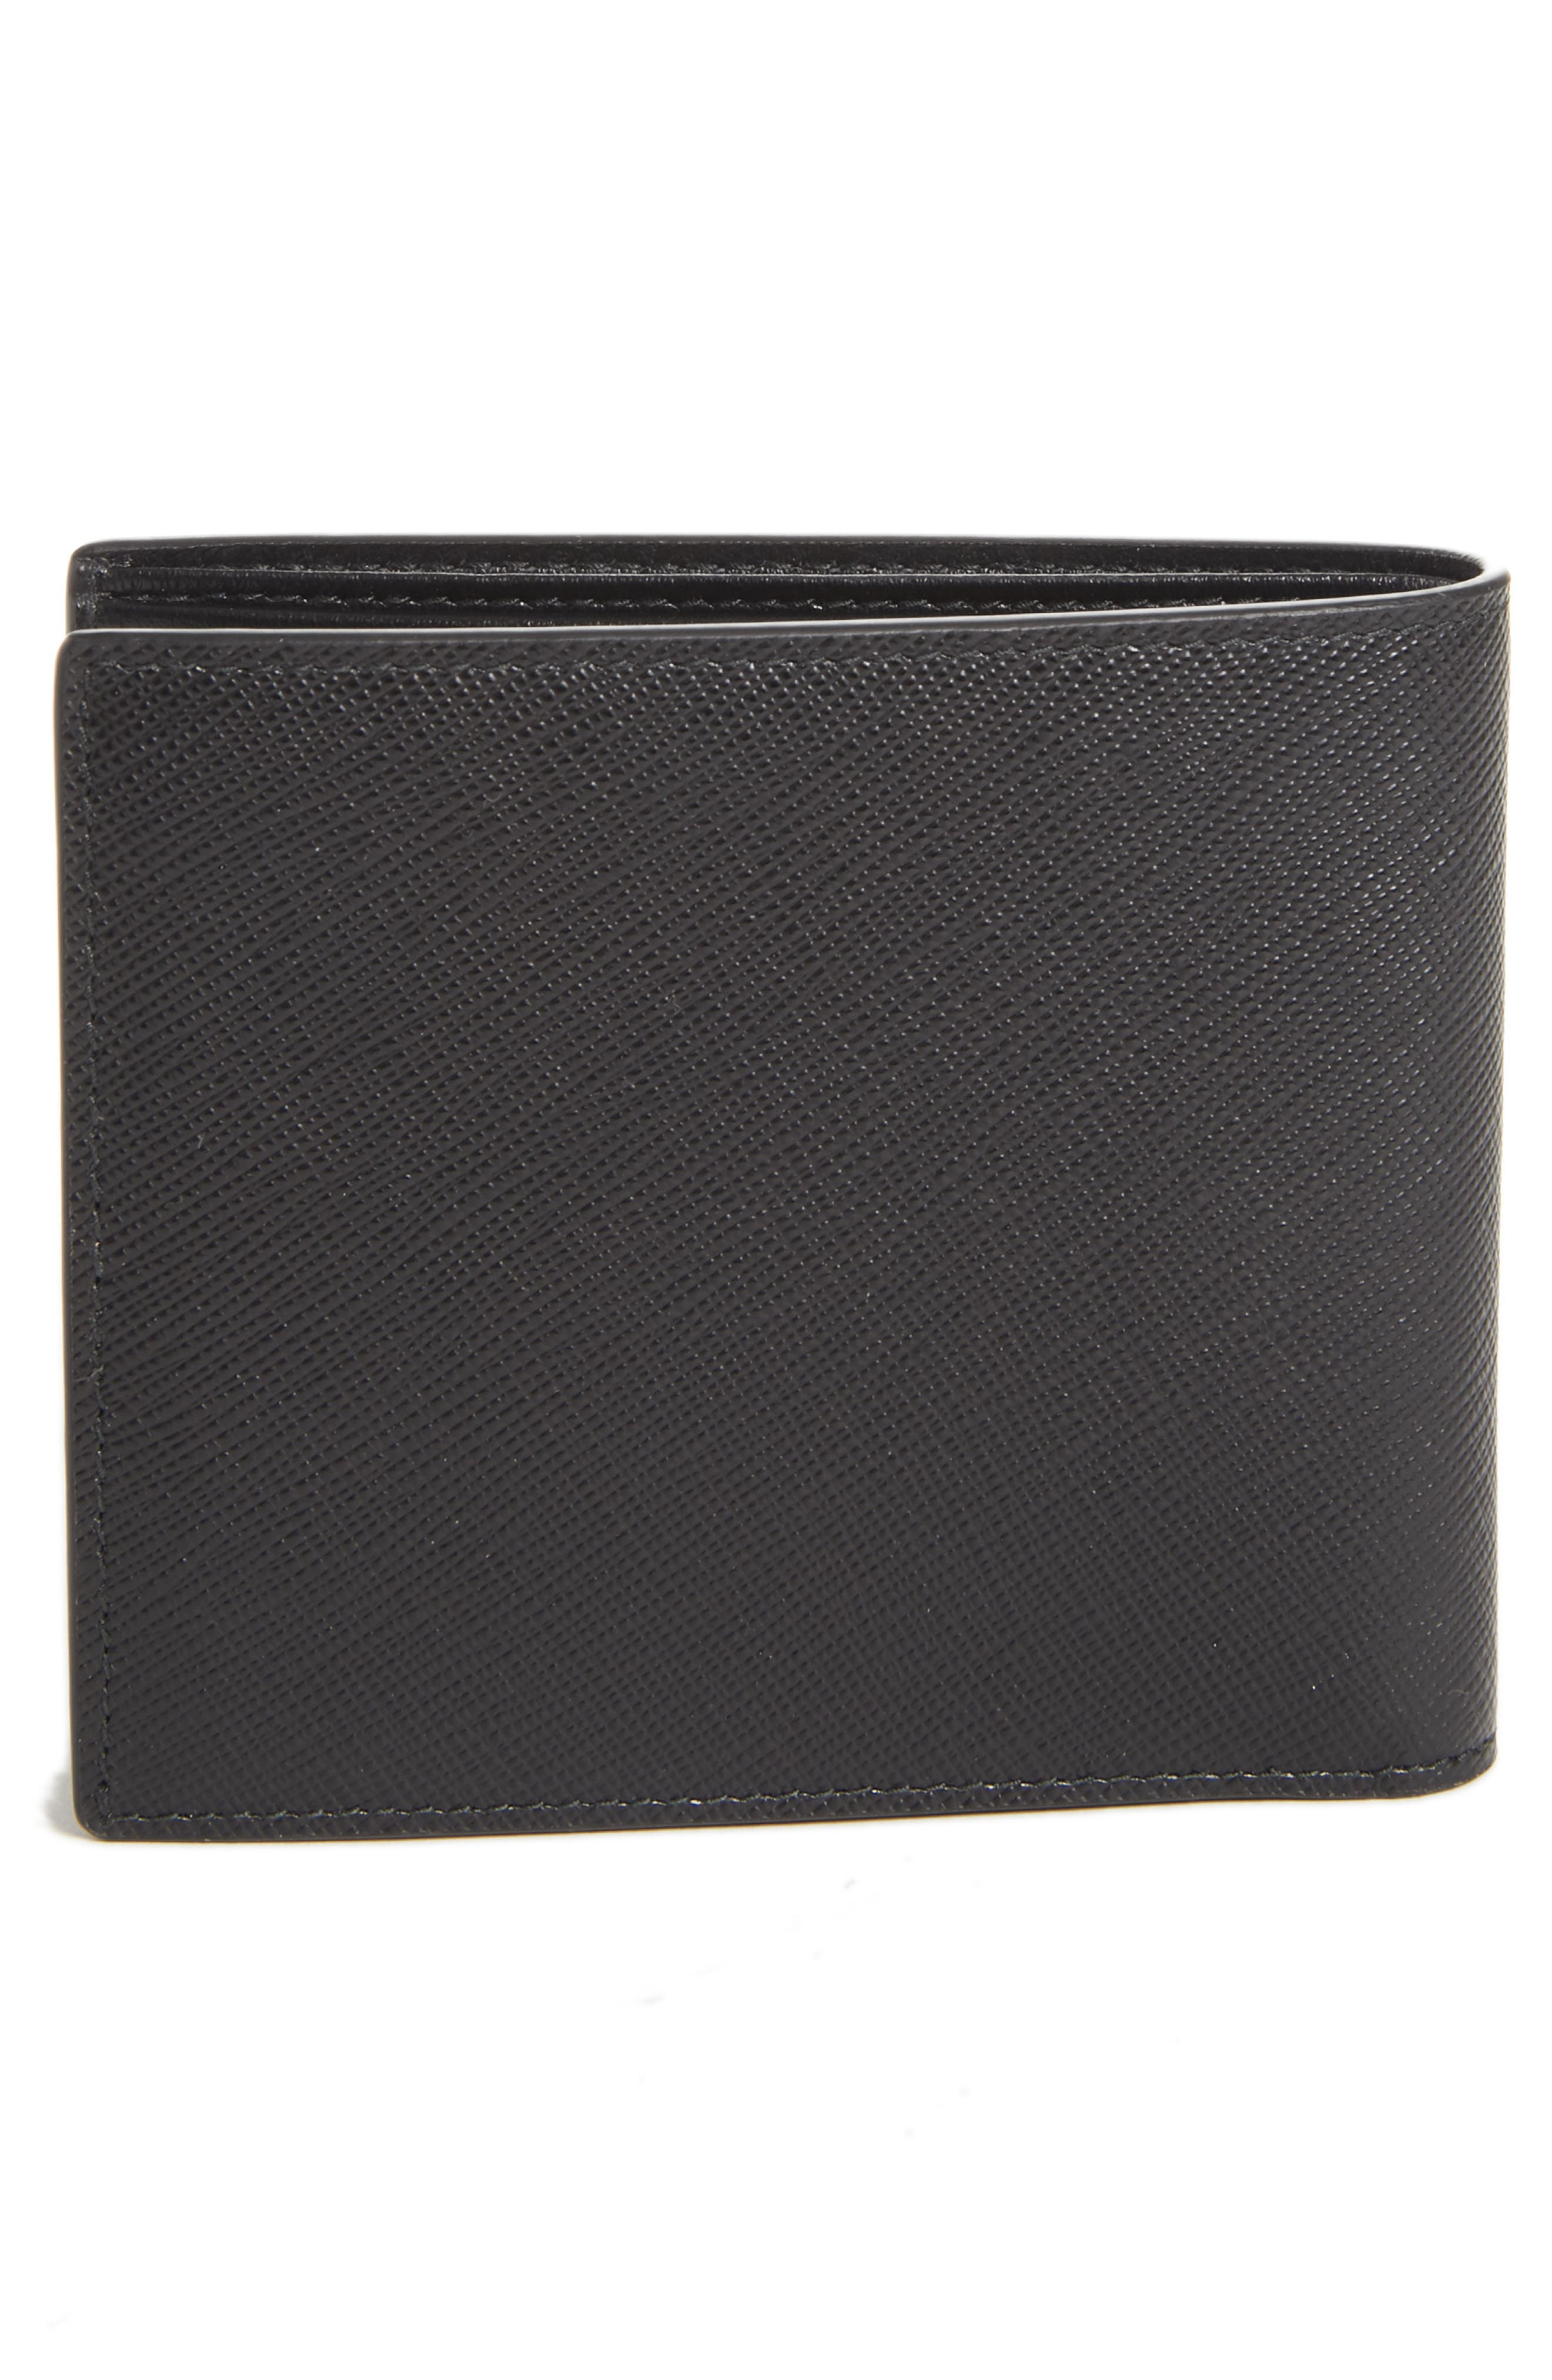 Saffiano Leather Bifold Wallet,                             Alternate thumbnail 3, color,                             BLACK